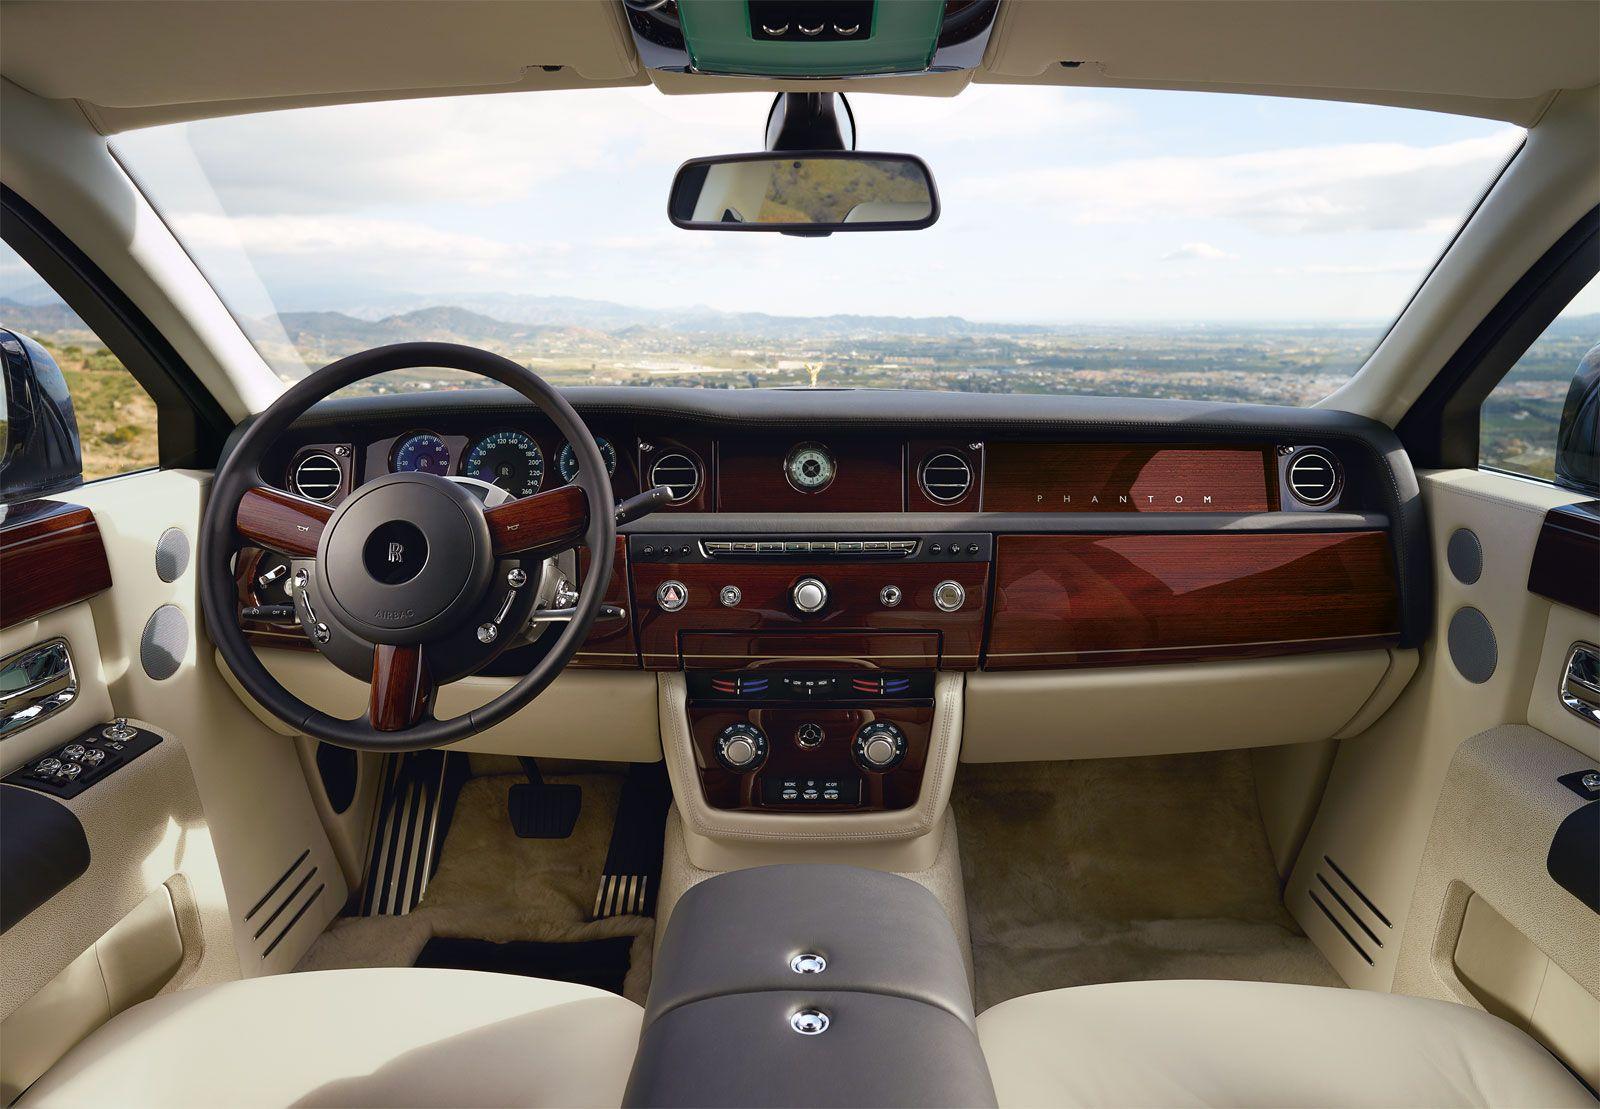 rolls royce phantom interior. Rolls Royce Phantom Interior | Rolls-Royce Extended (1) Sense R